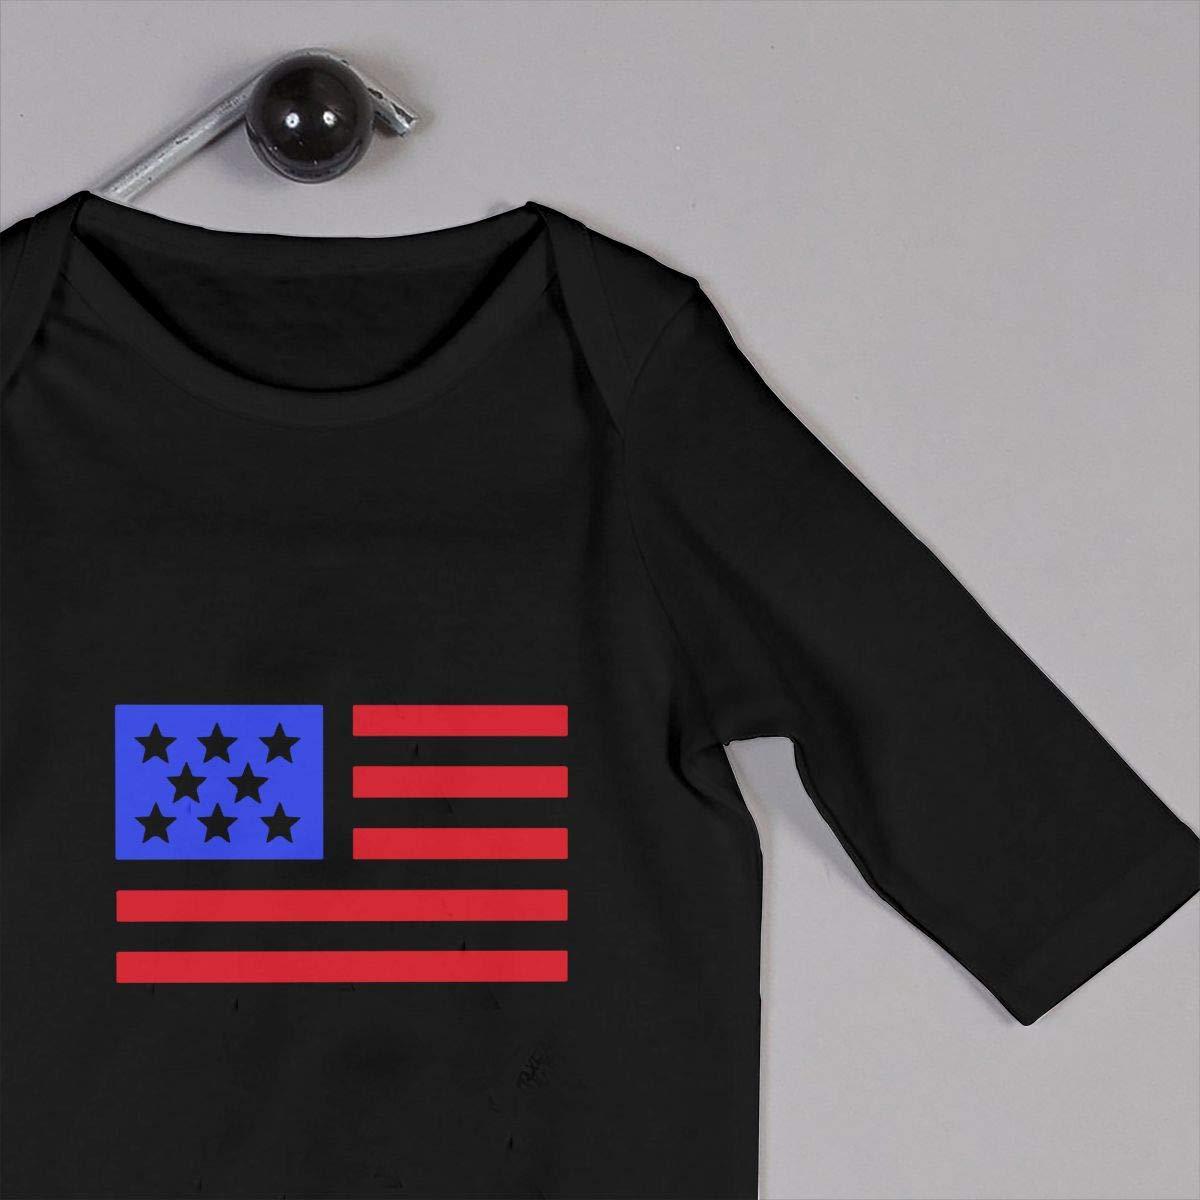 Db84UR@5p Newborn Baby Girls Boys Long Sleeve Jumpsuit Warm Abstract American Flag Cotton Romper